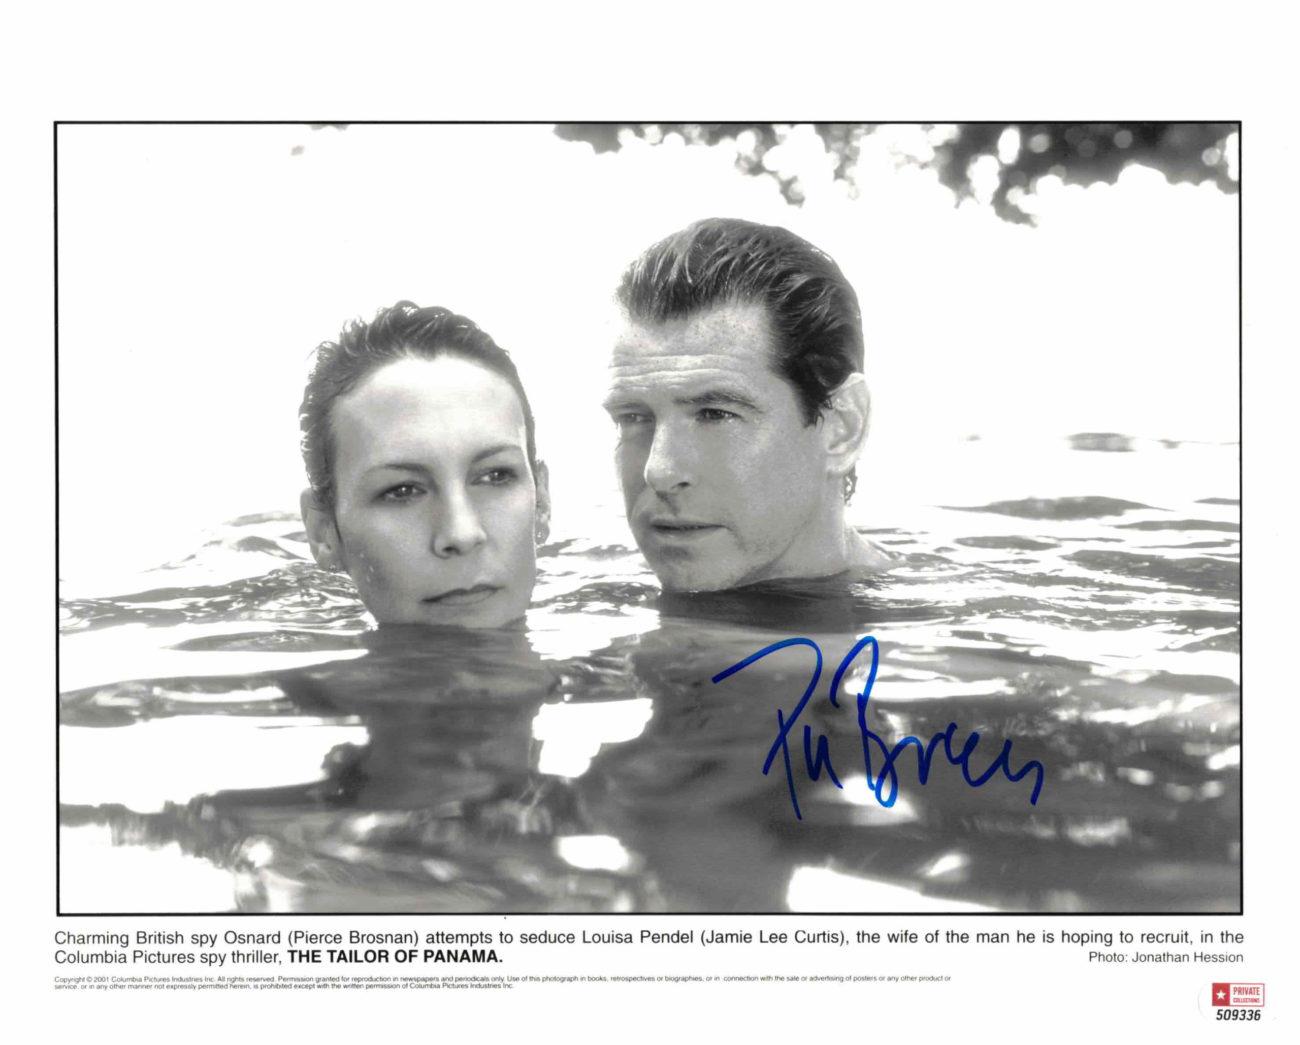 Pierce Brosnan - autogram